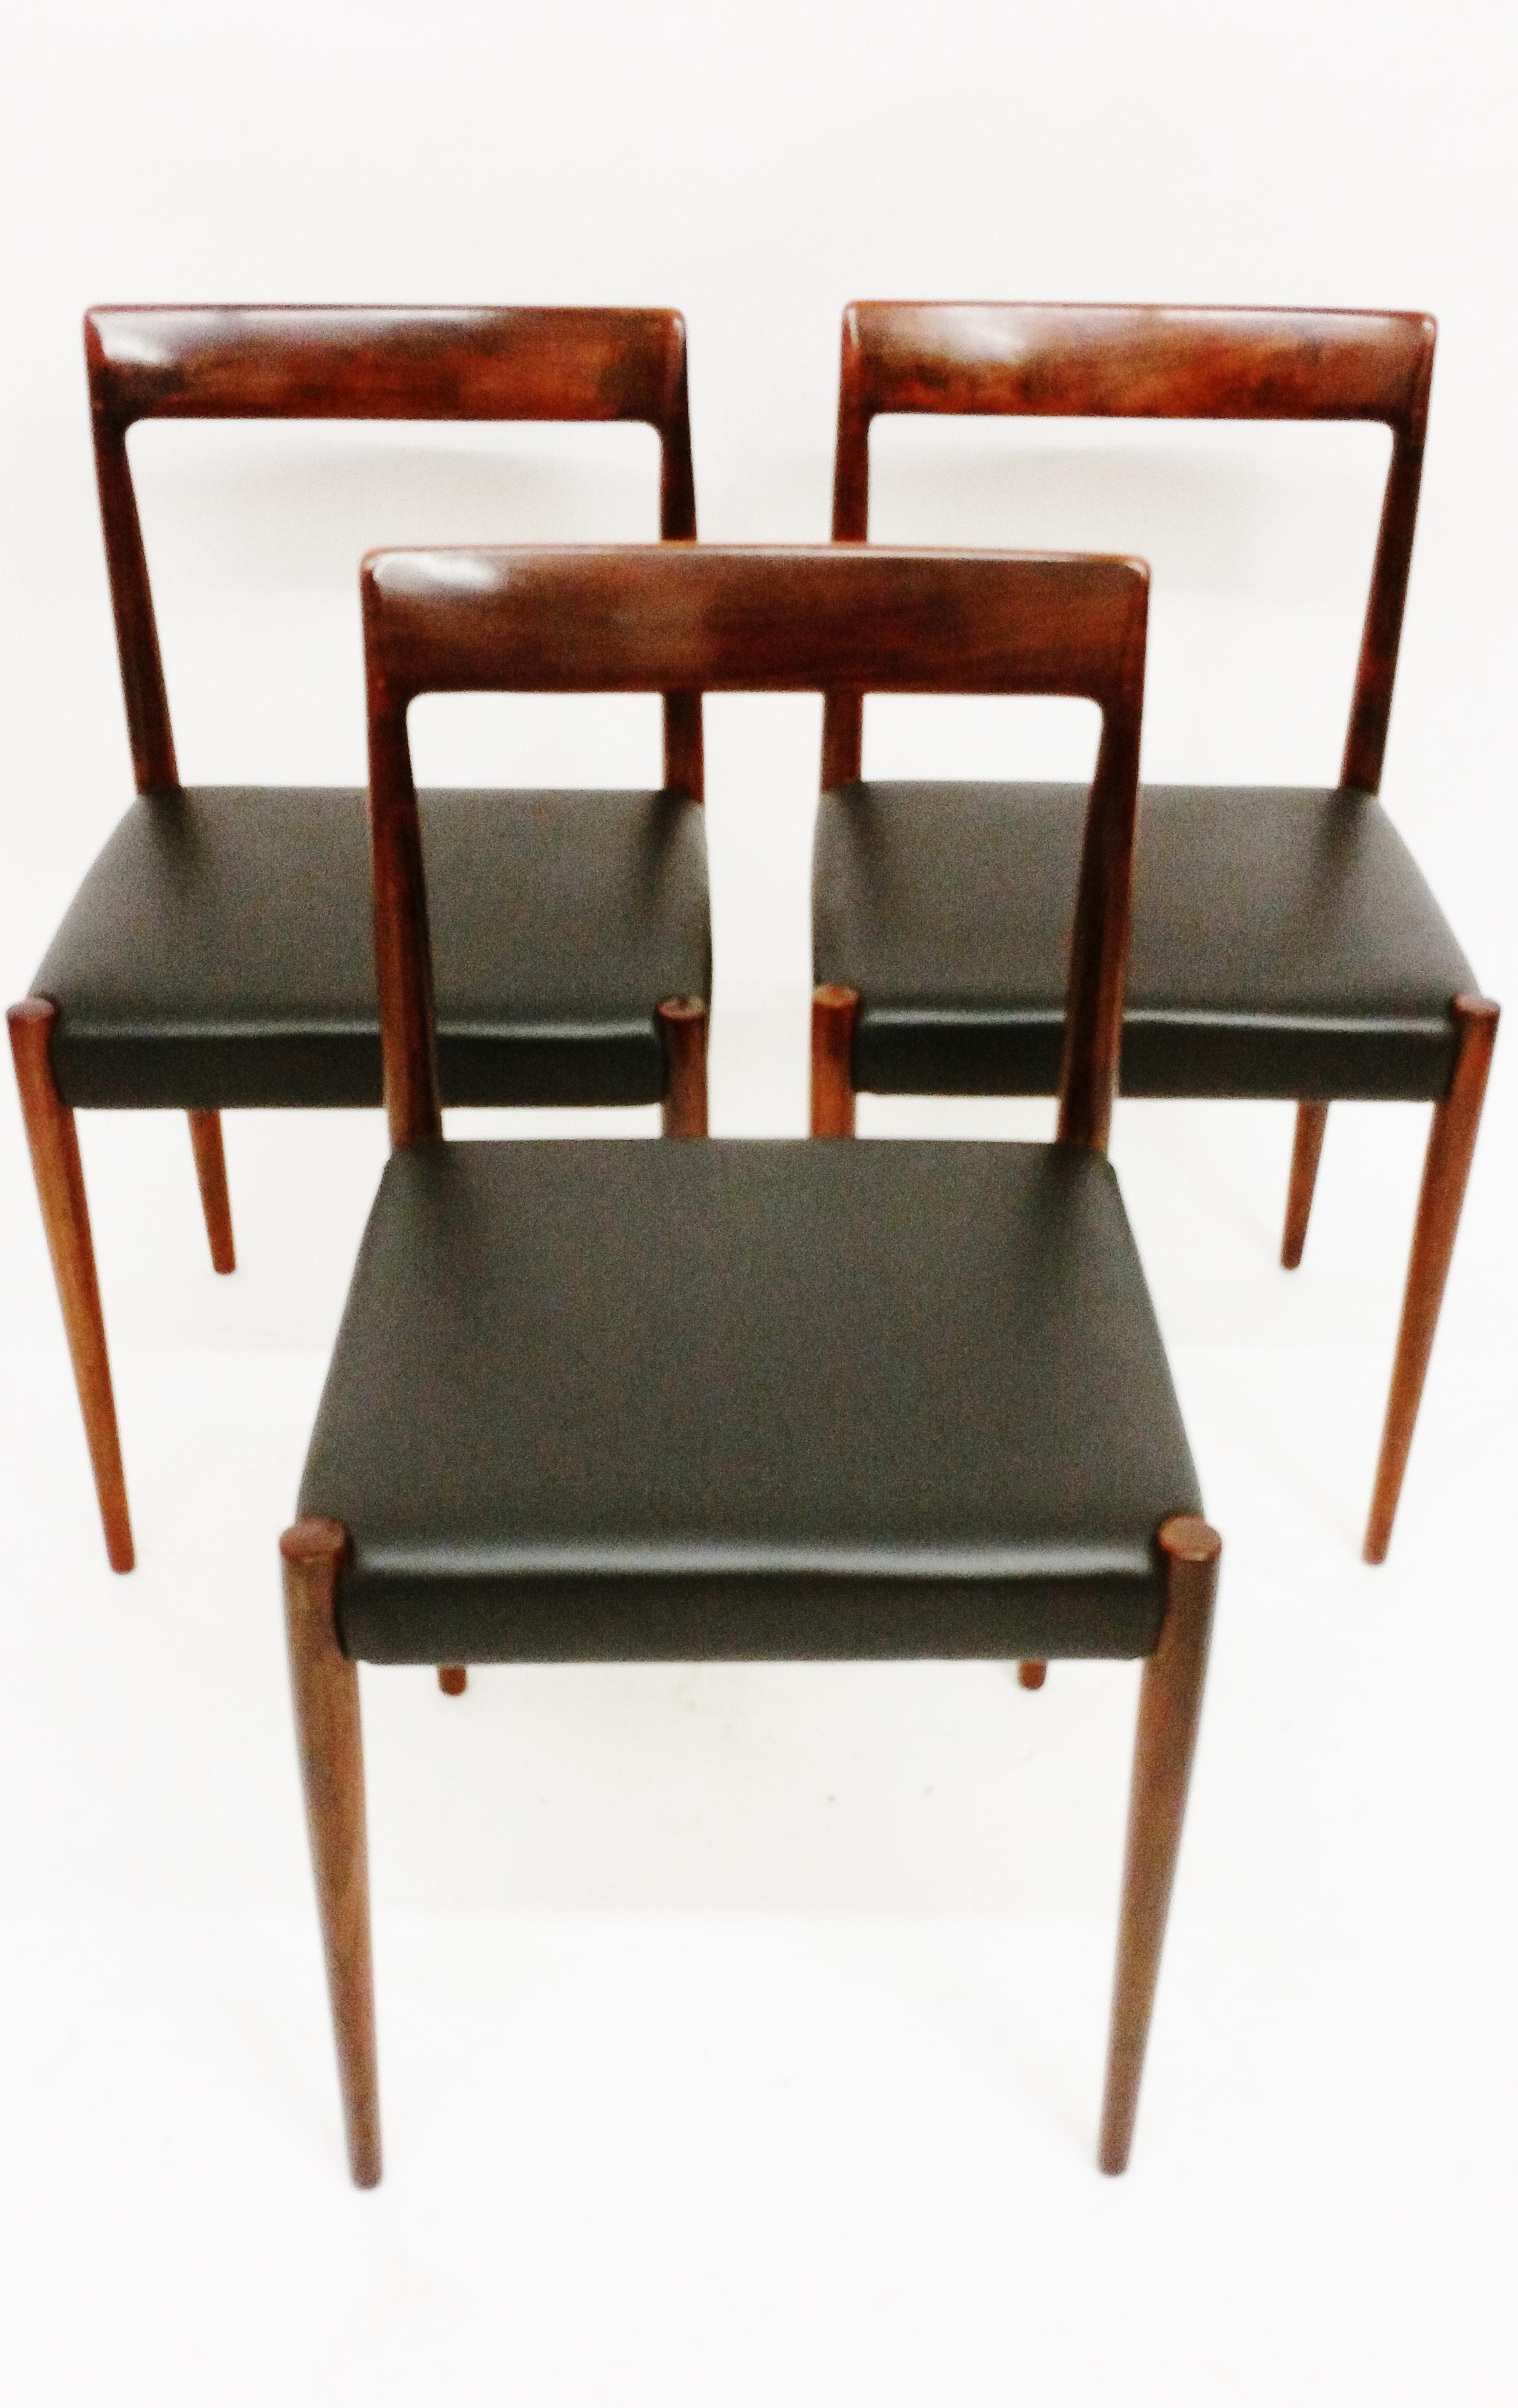 Palasander dining chair